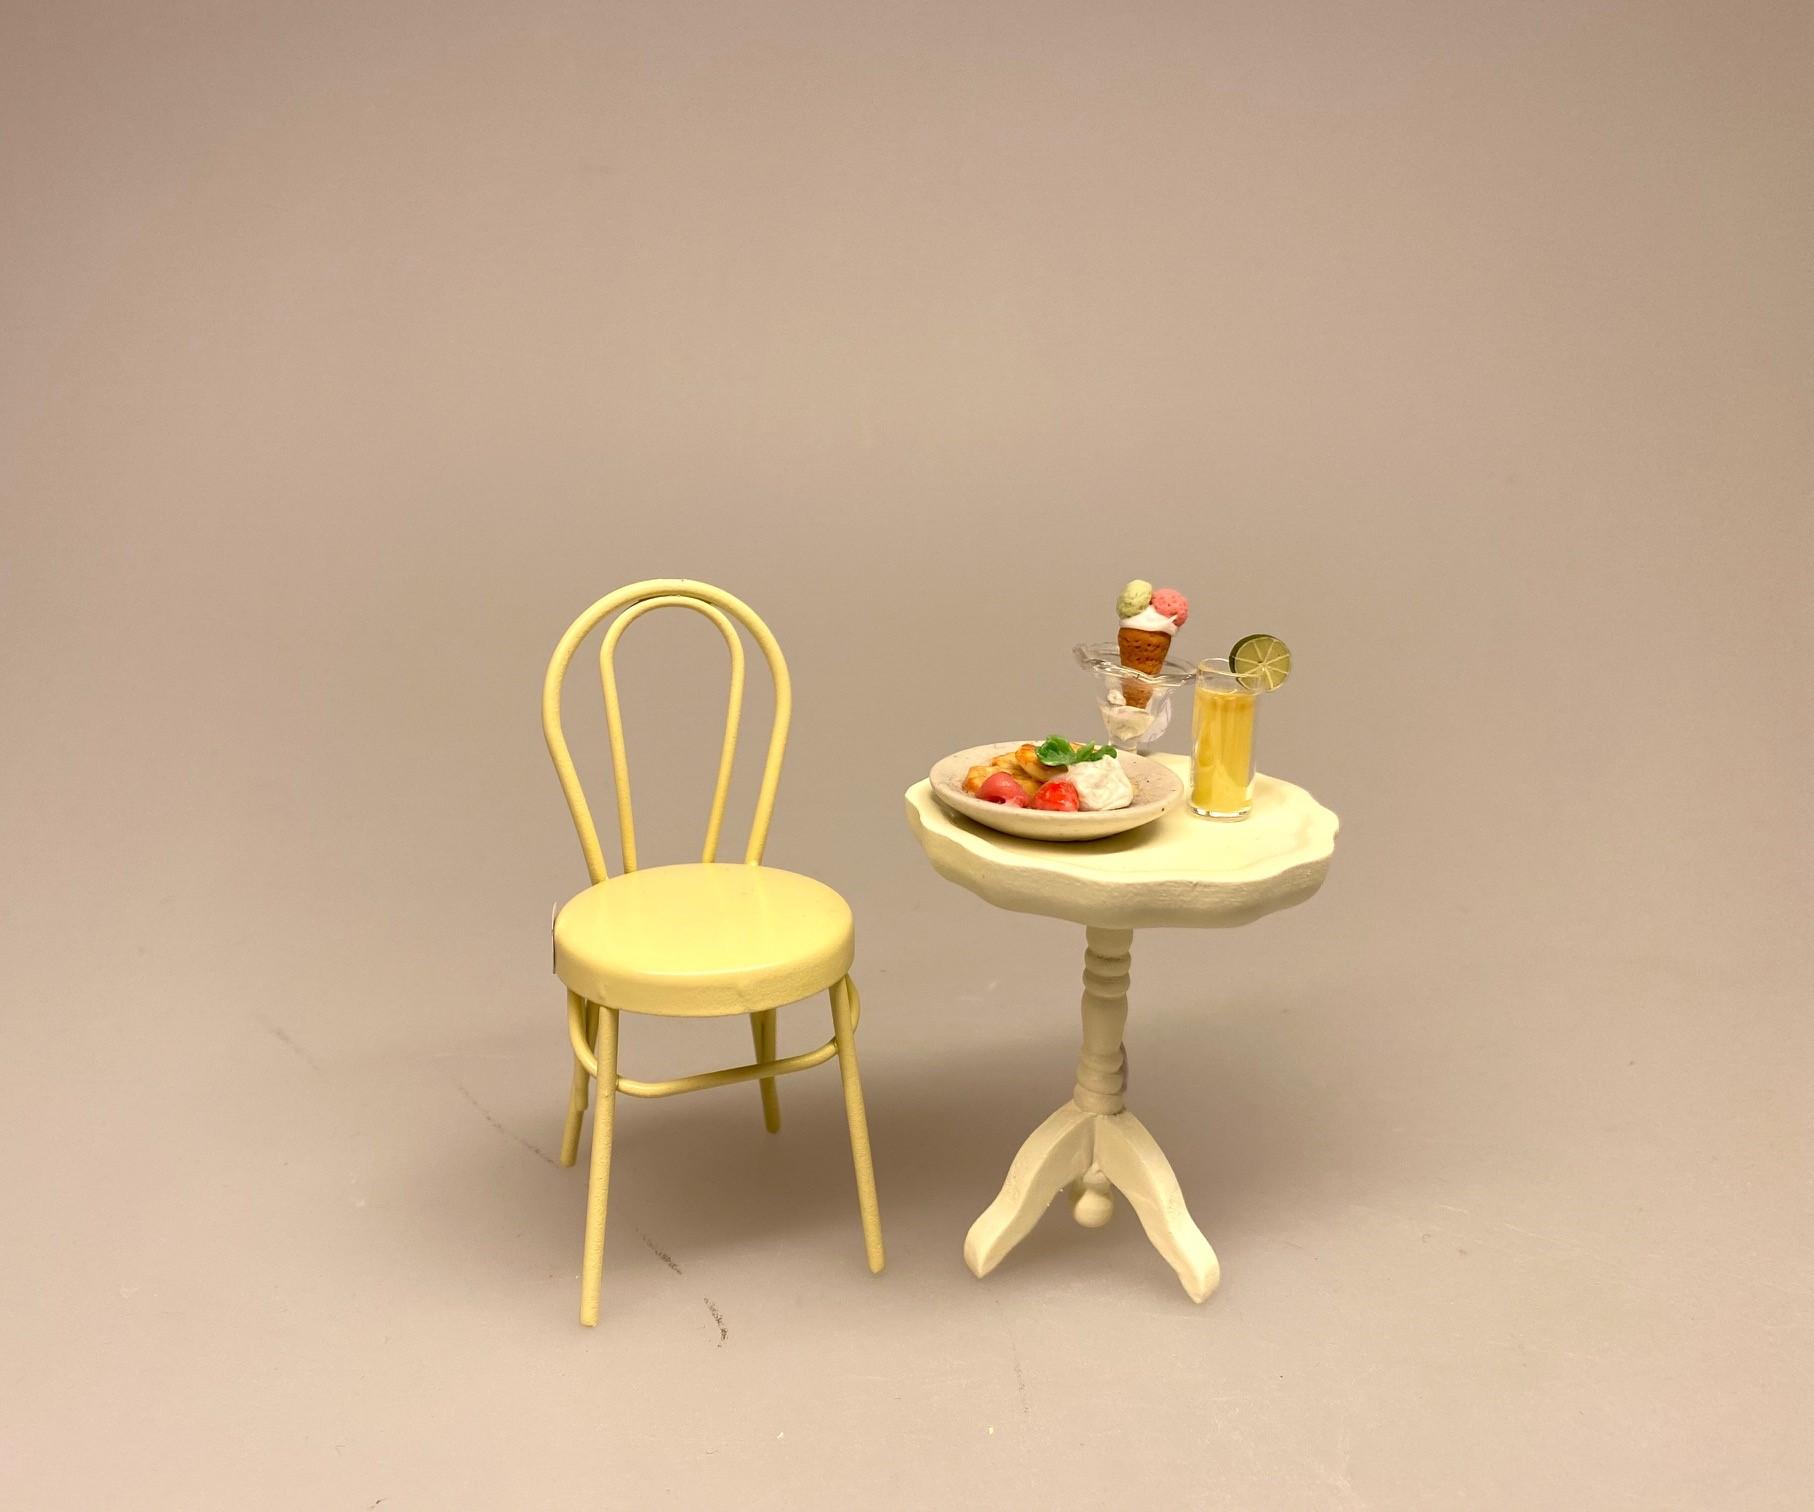 Miniature Metal Stol - Creme, flødefarvet, caféstol, konditori, dukkehus, dukkehusting, dukkemøbler, dukkehusmøbler, dukkestue, dukkehuse, ting til, miniaturer, skala 1/12, 1:12, biti, ribe, små ting, sætterkasse, symbolsk, sangskjuler,